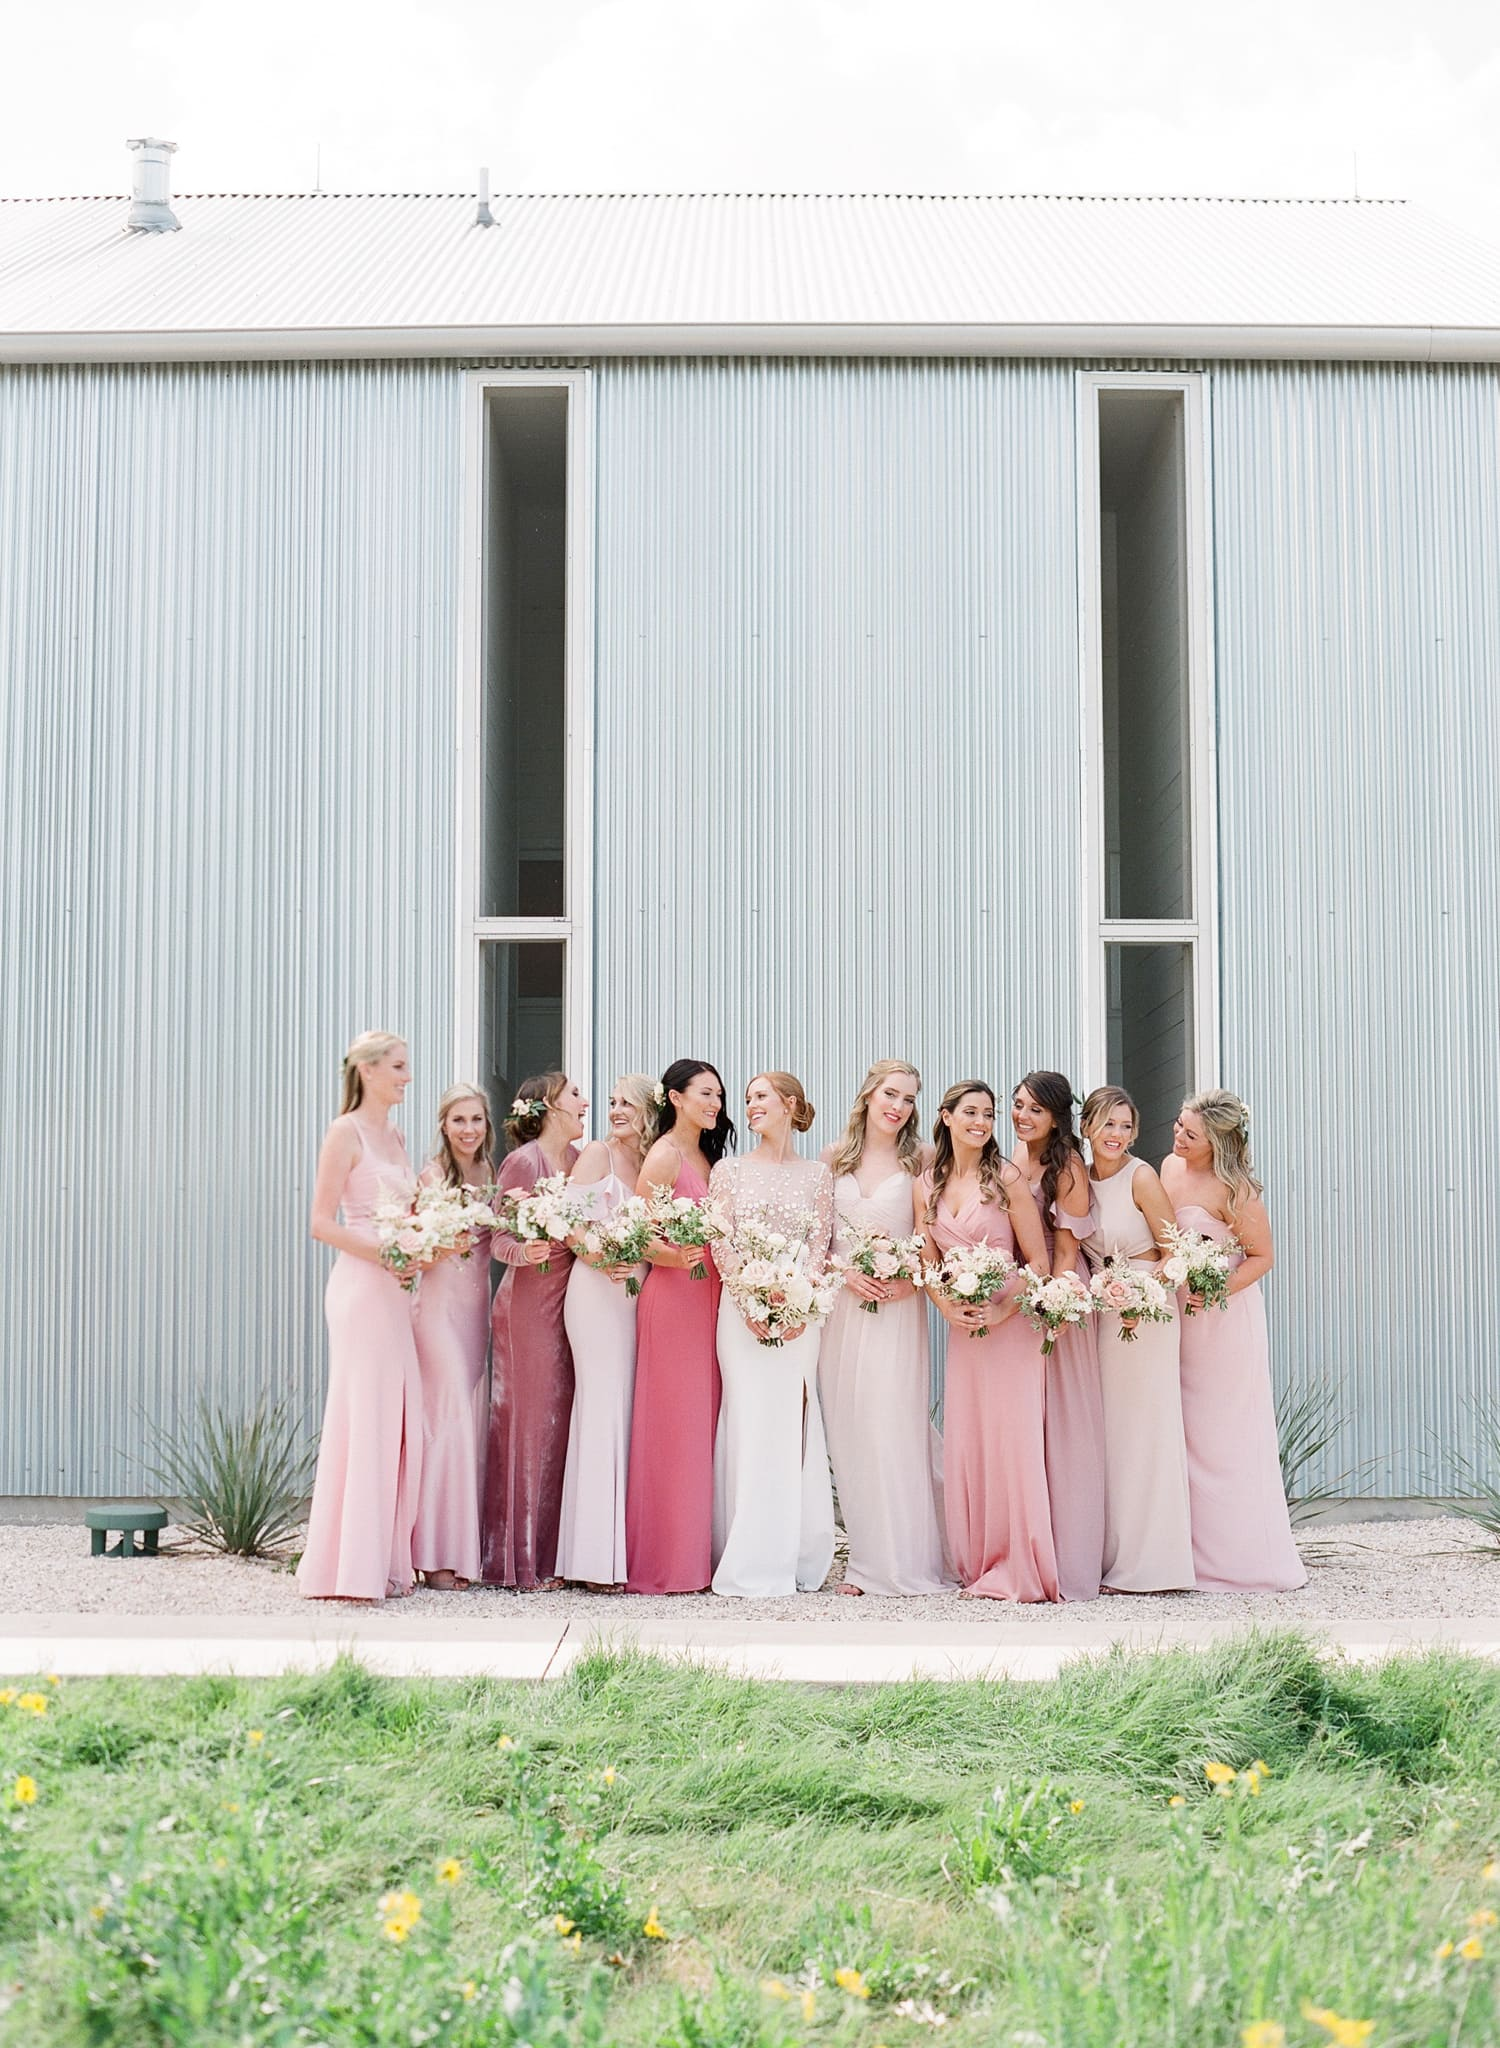 PROSPECT_HOUSE_WEDDING_AUSTIN_TX_MATTHEW_MOORE-00224.jpg